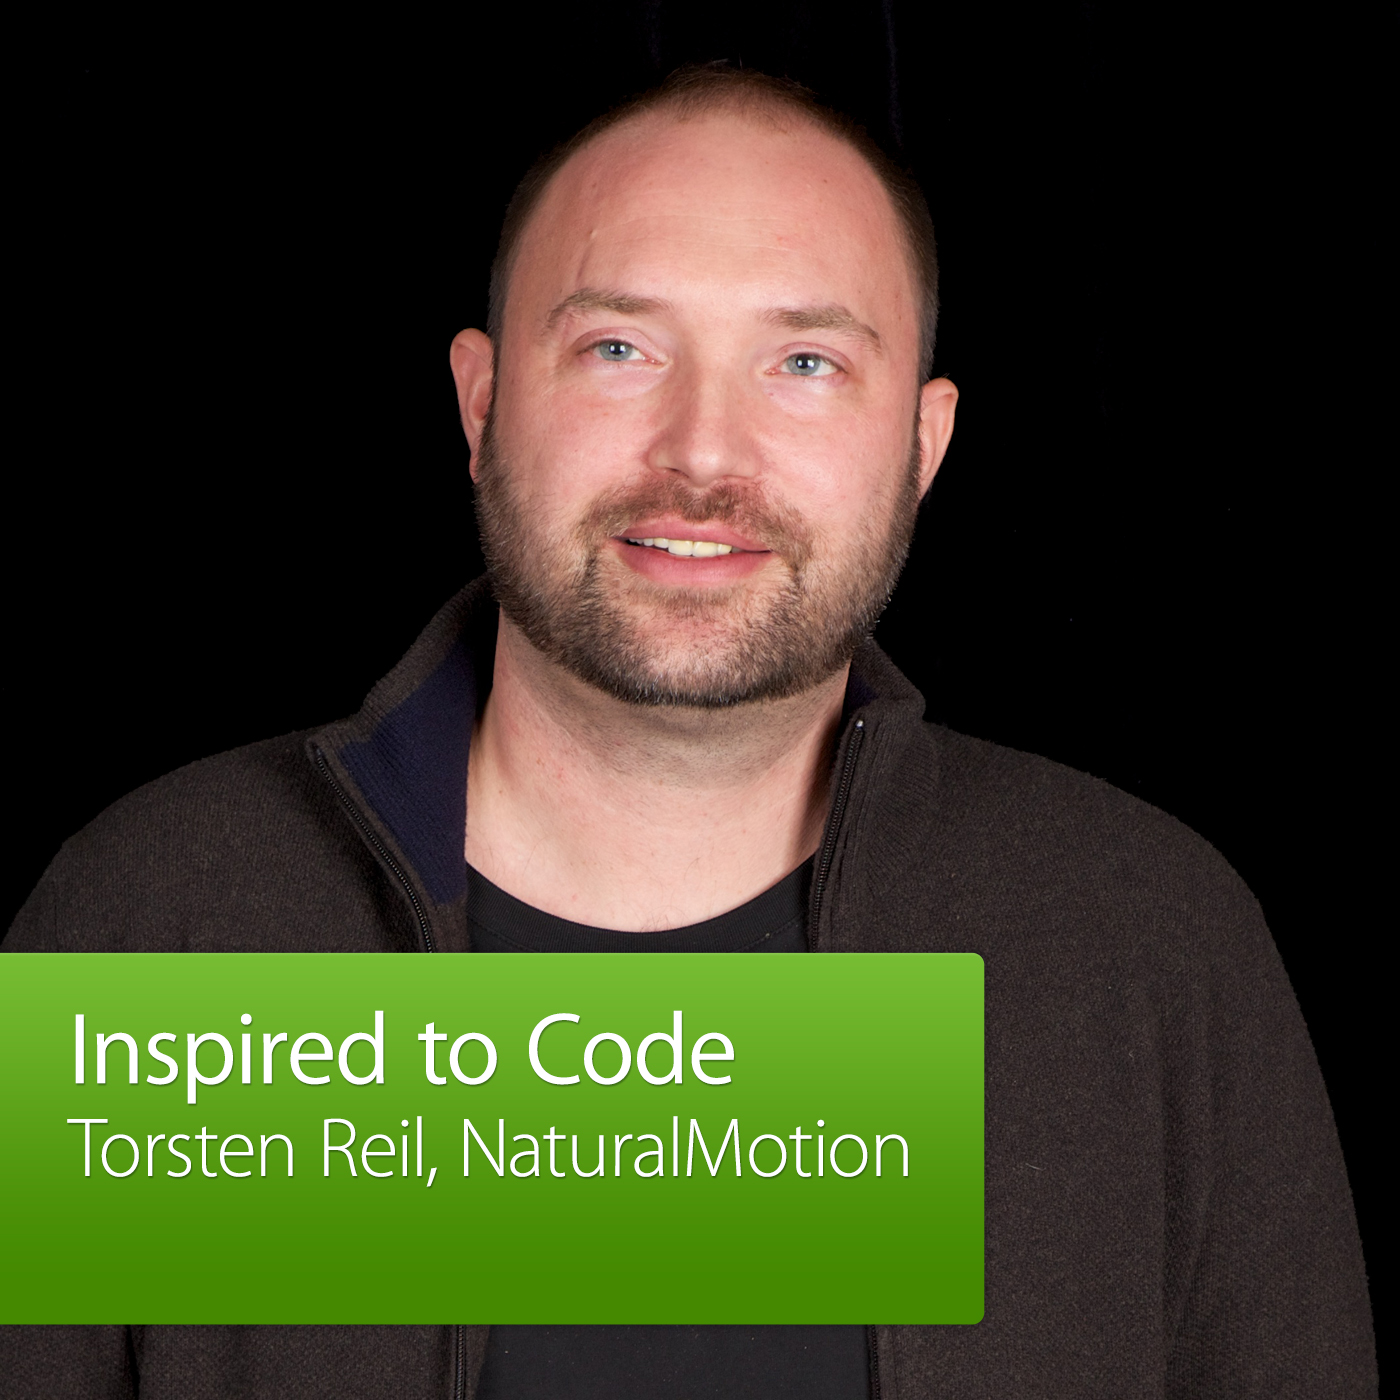 Torsten Reil, NaturalMotion: Inspired to Code